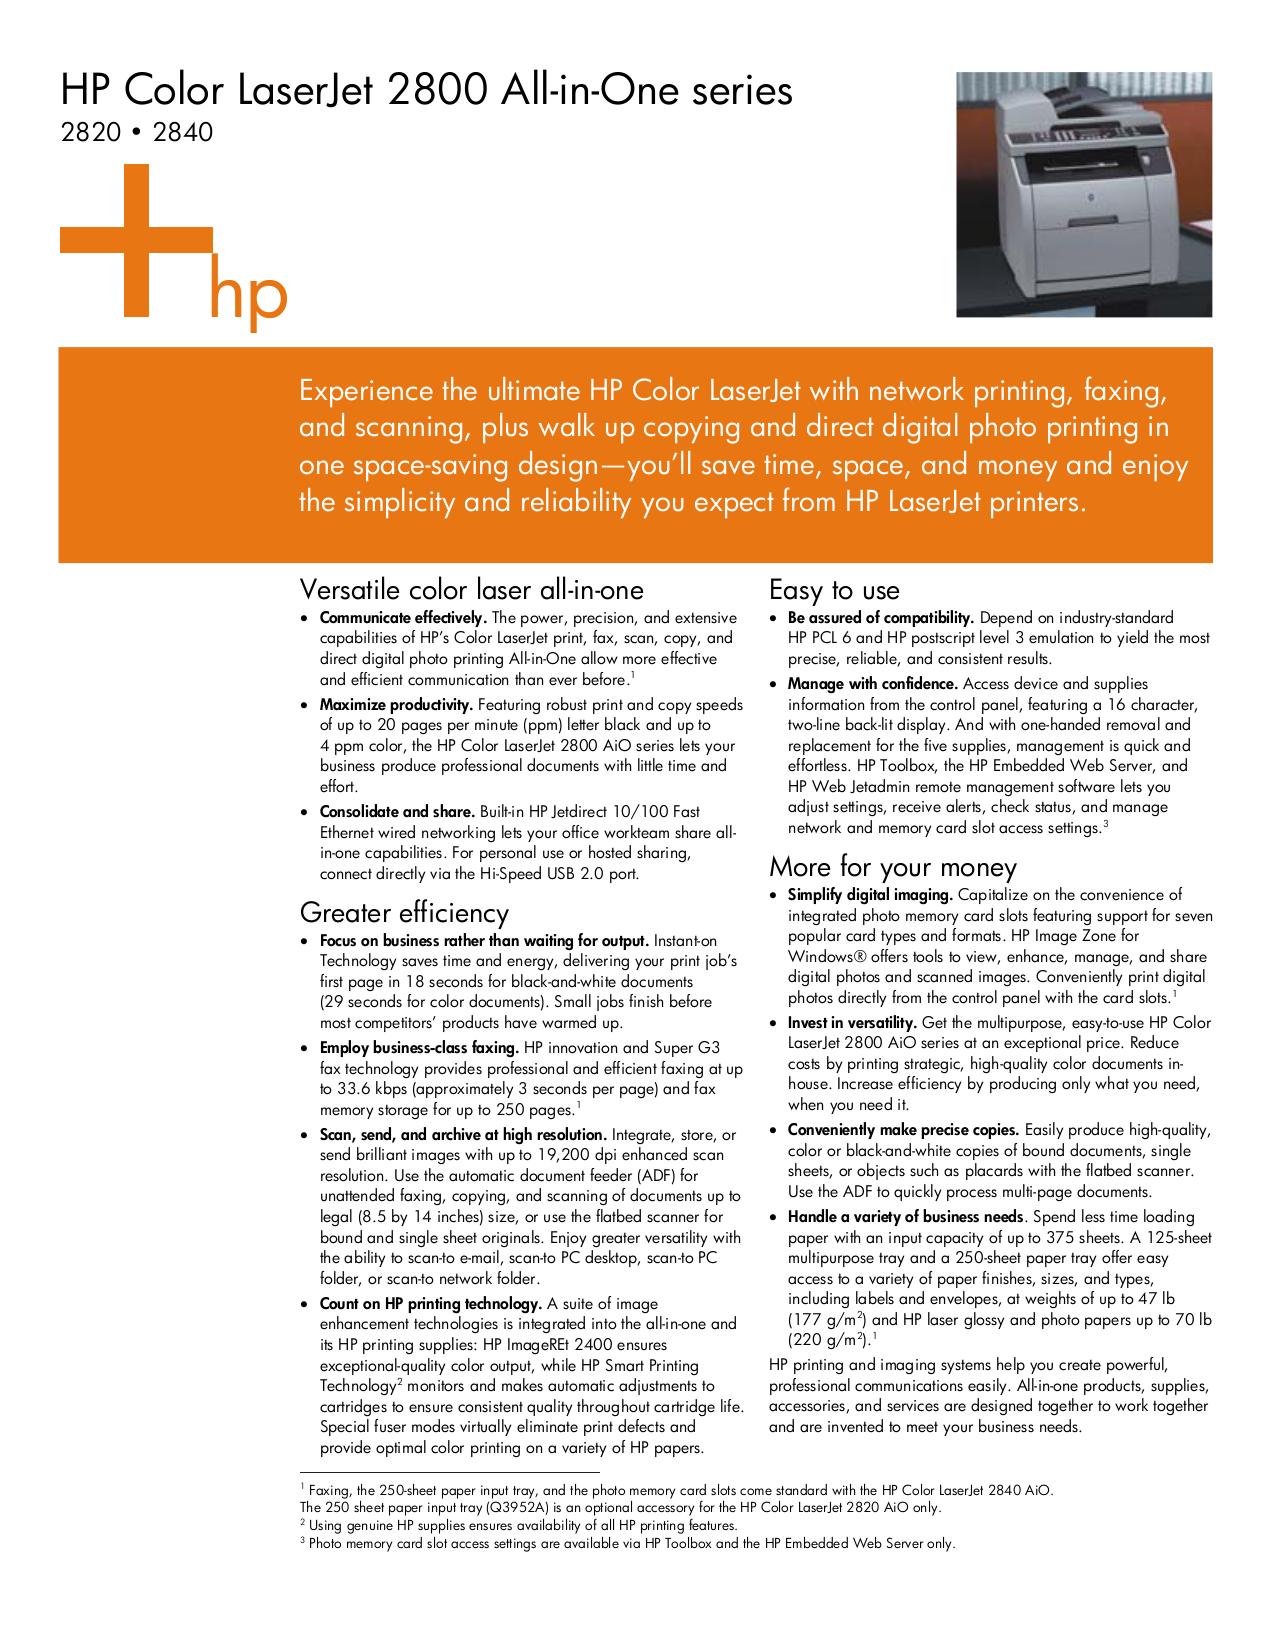 pdf for HP Multifunction Printer Laserjet,Color Laserjet 2840 manual